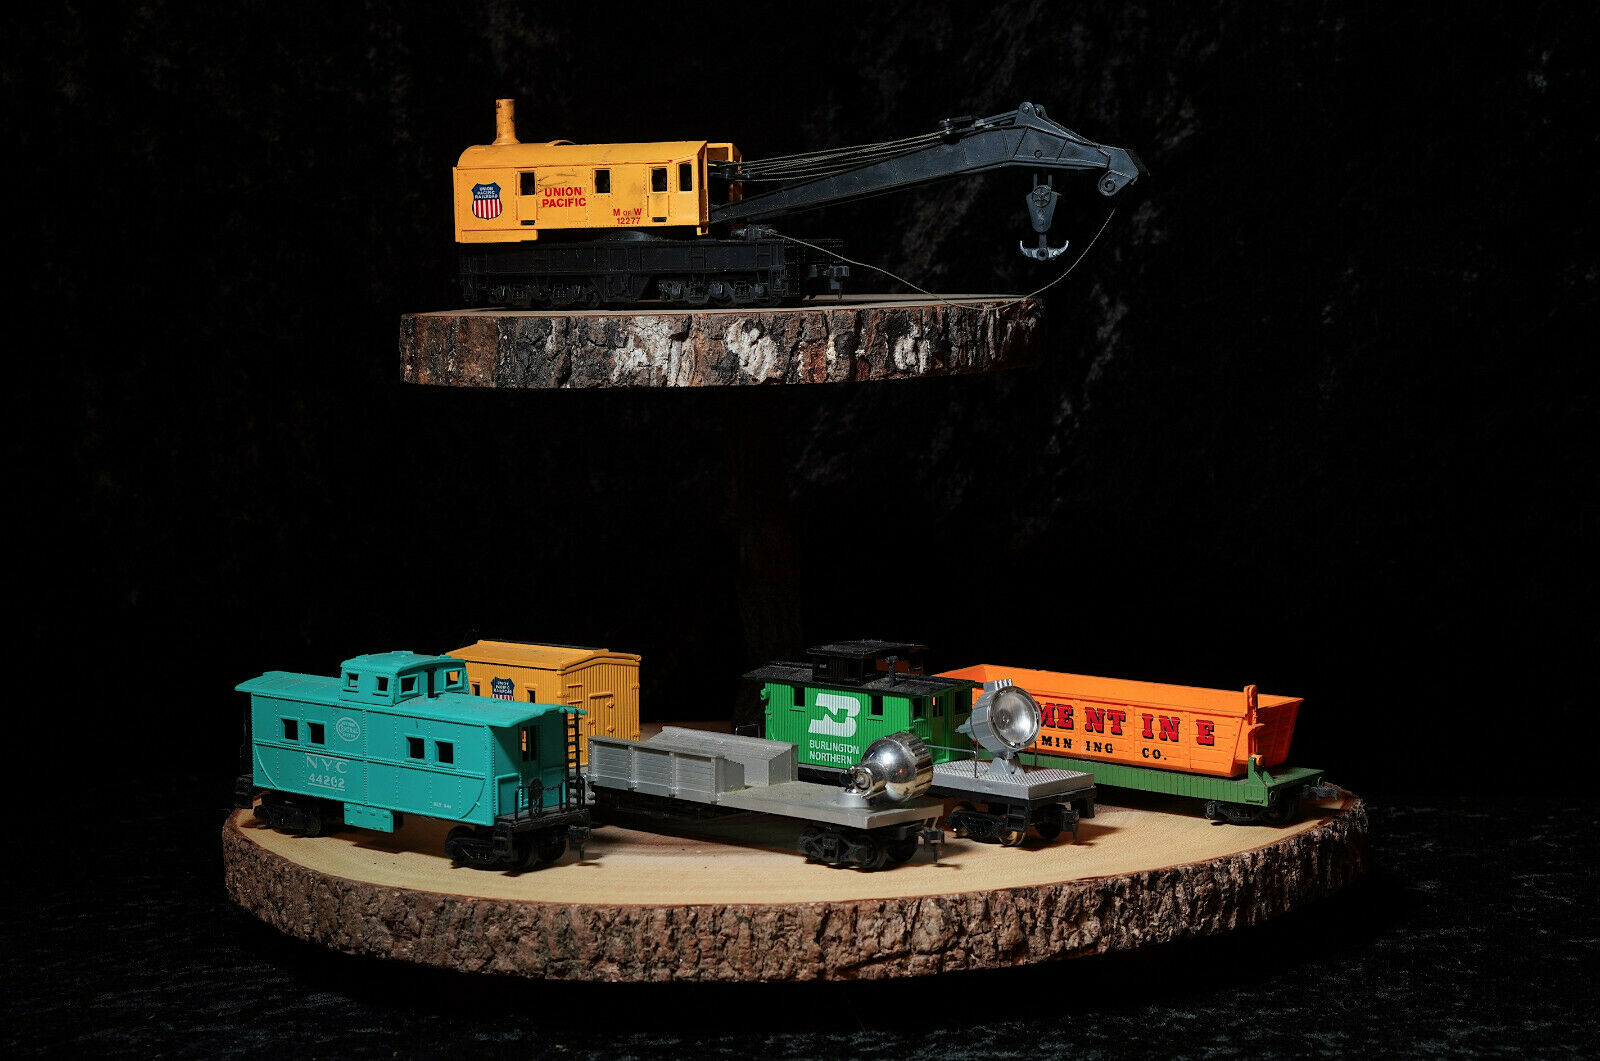 Vintage railway auto rail train ho railstrada CRANE Searchluci Union Pacific Etc